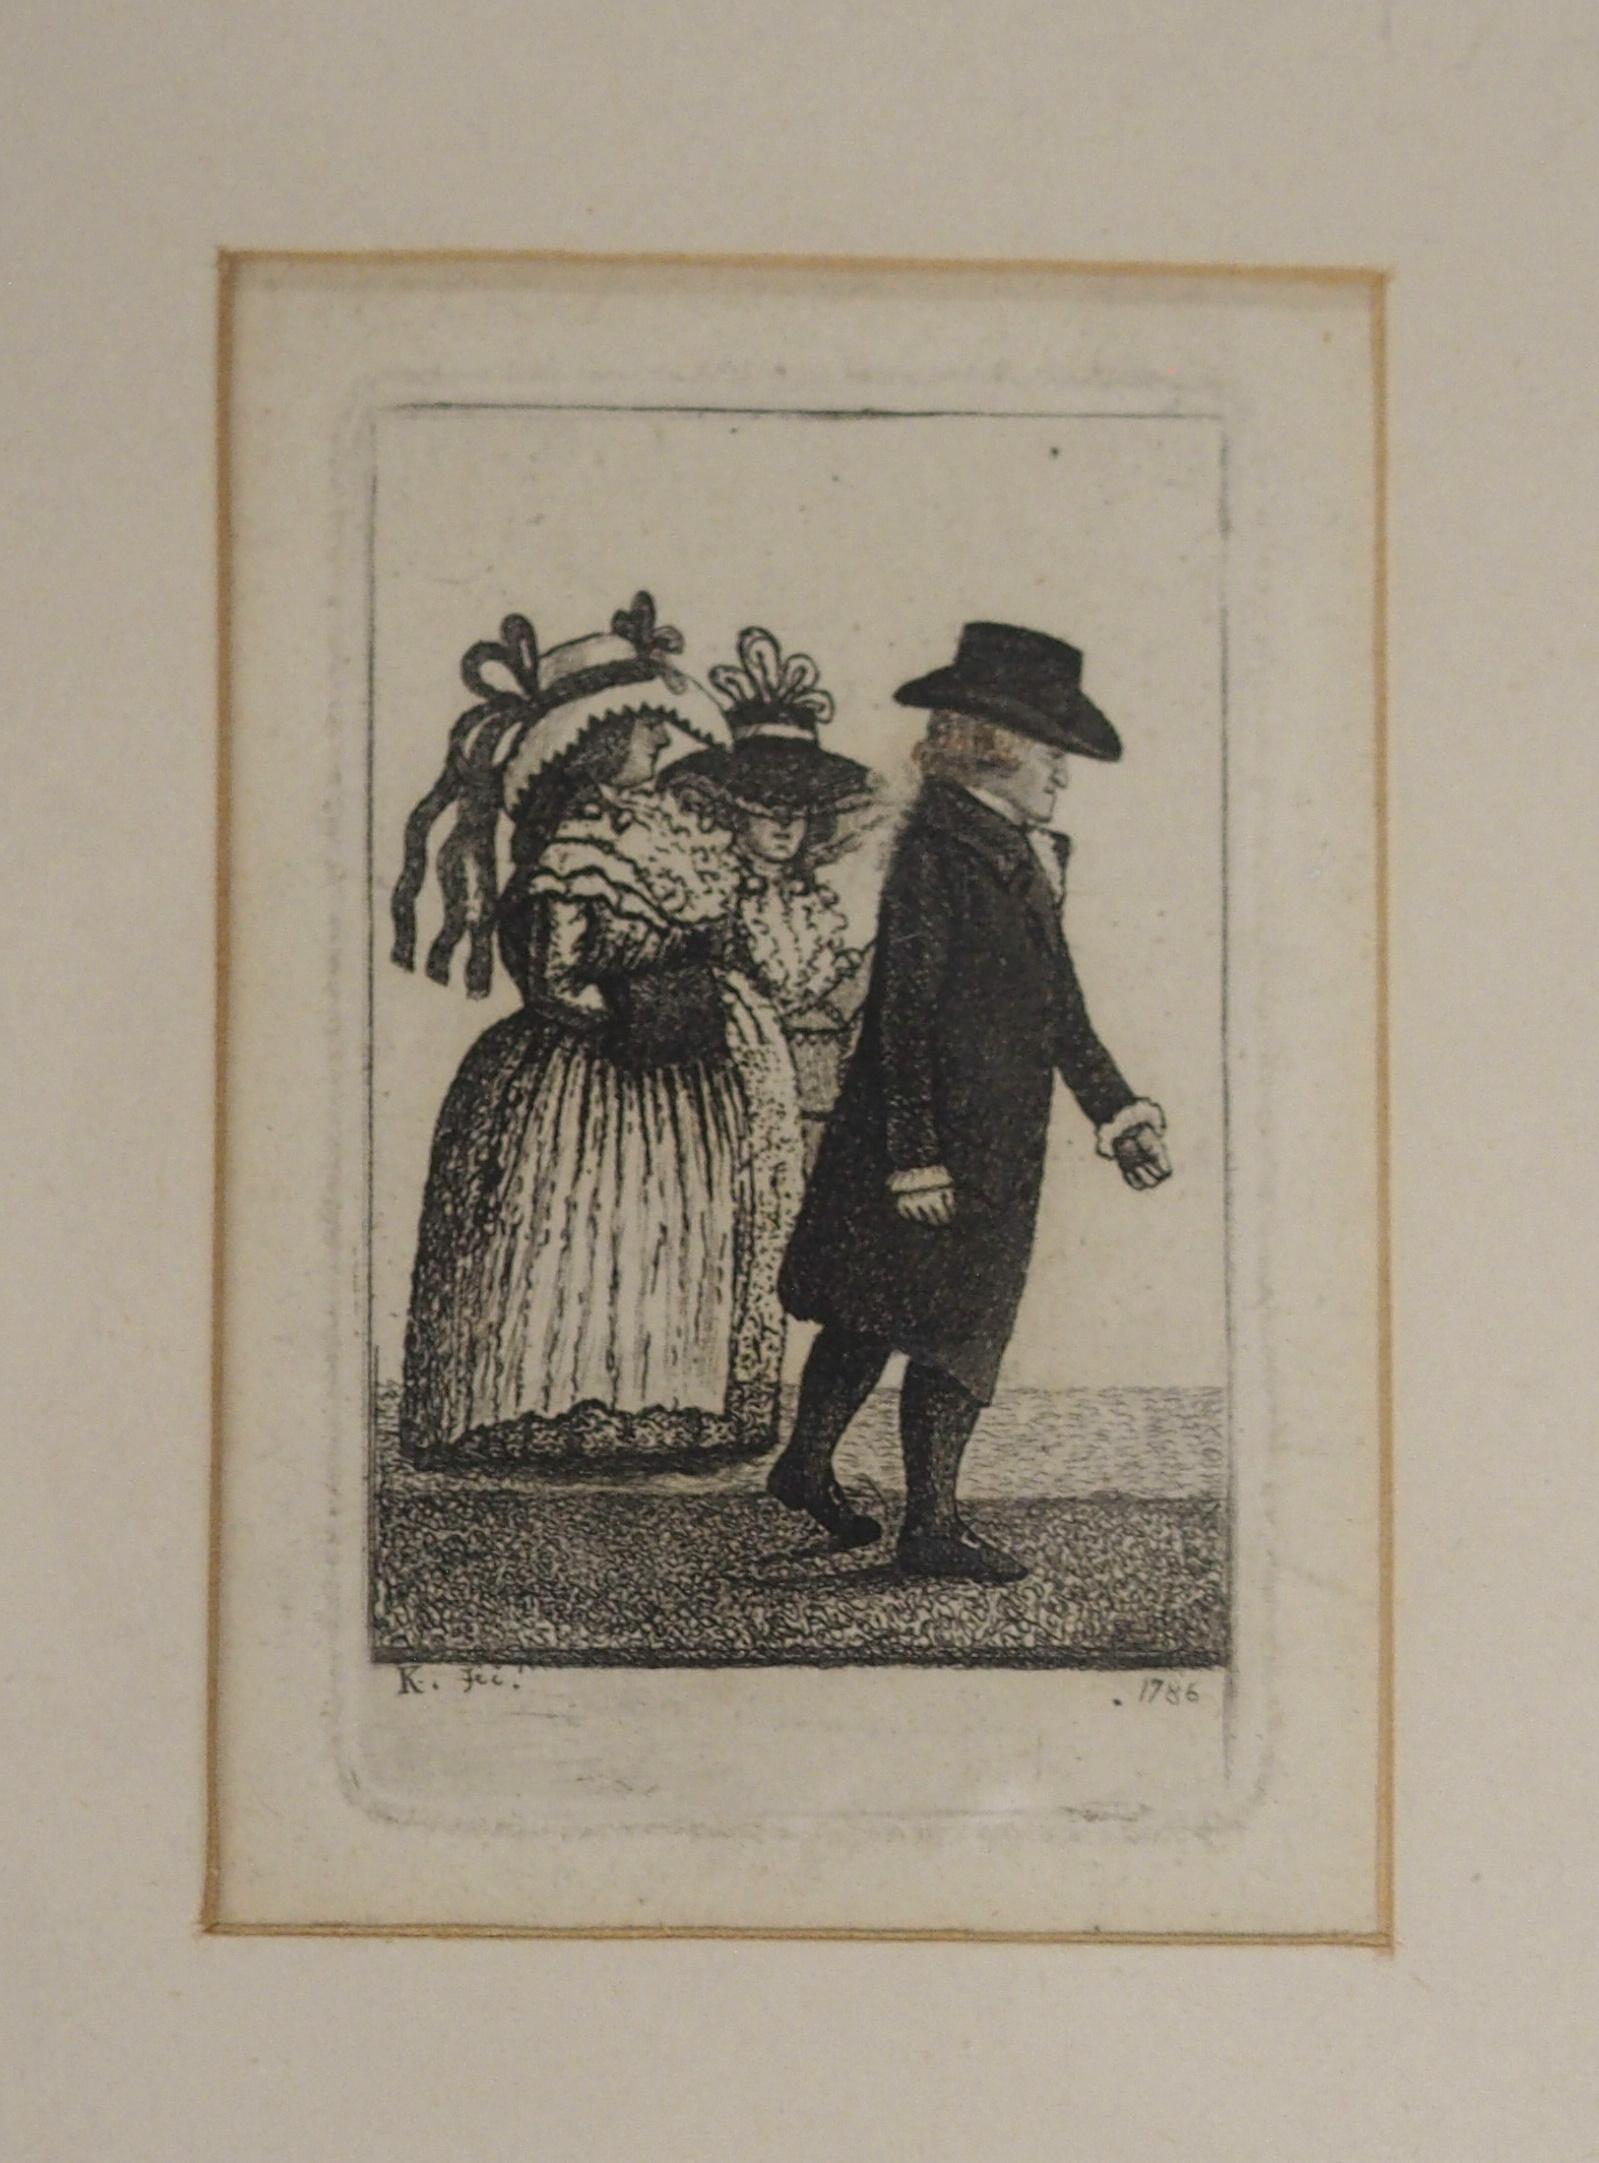 AFTER JOHN DUNCAN THE HEADLESS HORSEMAN engraving, 12 x 8cm, Admiral Viscount Duncan print, three - Image 2 of 12